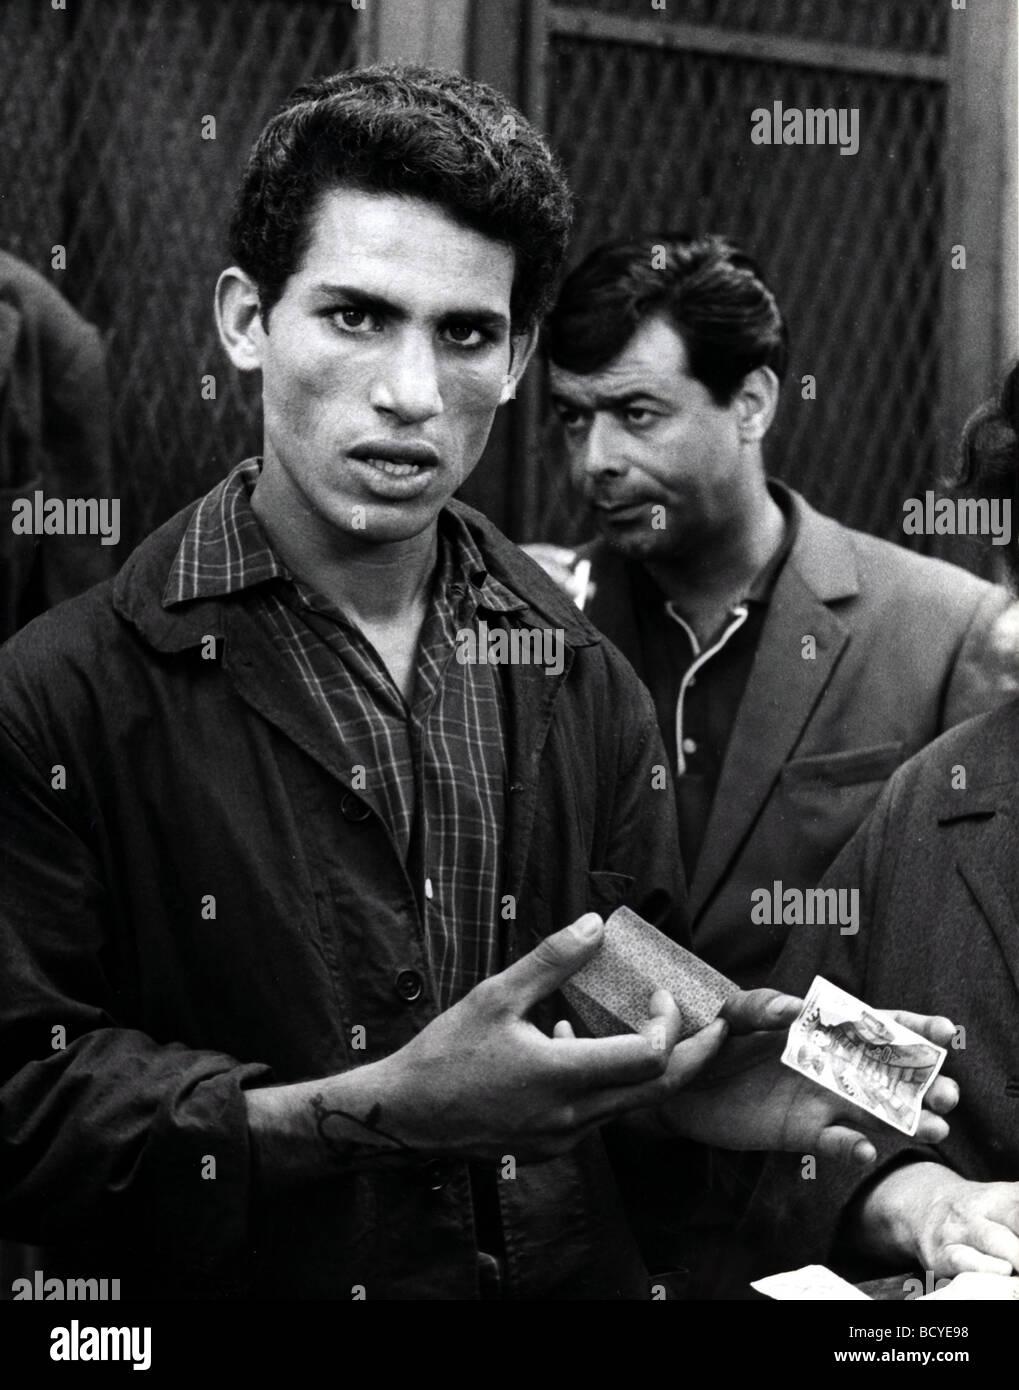 La Battaglia di Algeri Año : 1965 Director : Gillo Pontecorvo Imagen De Stock